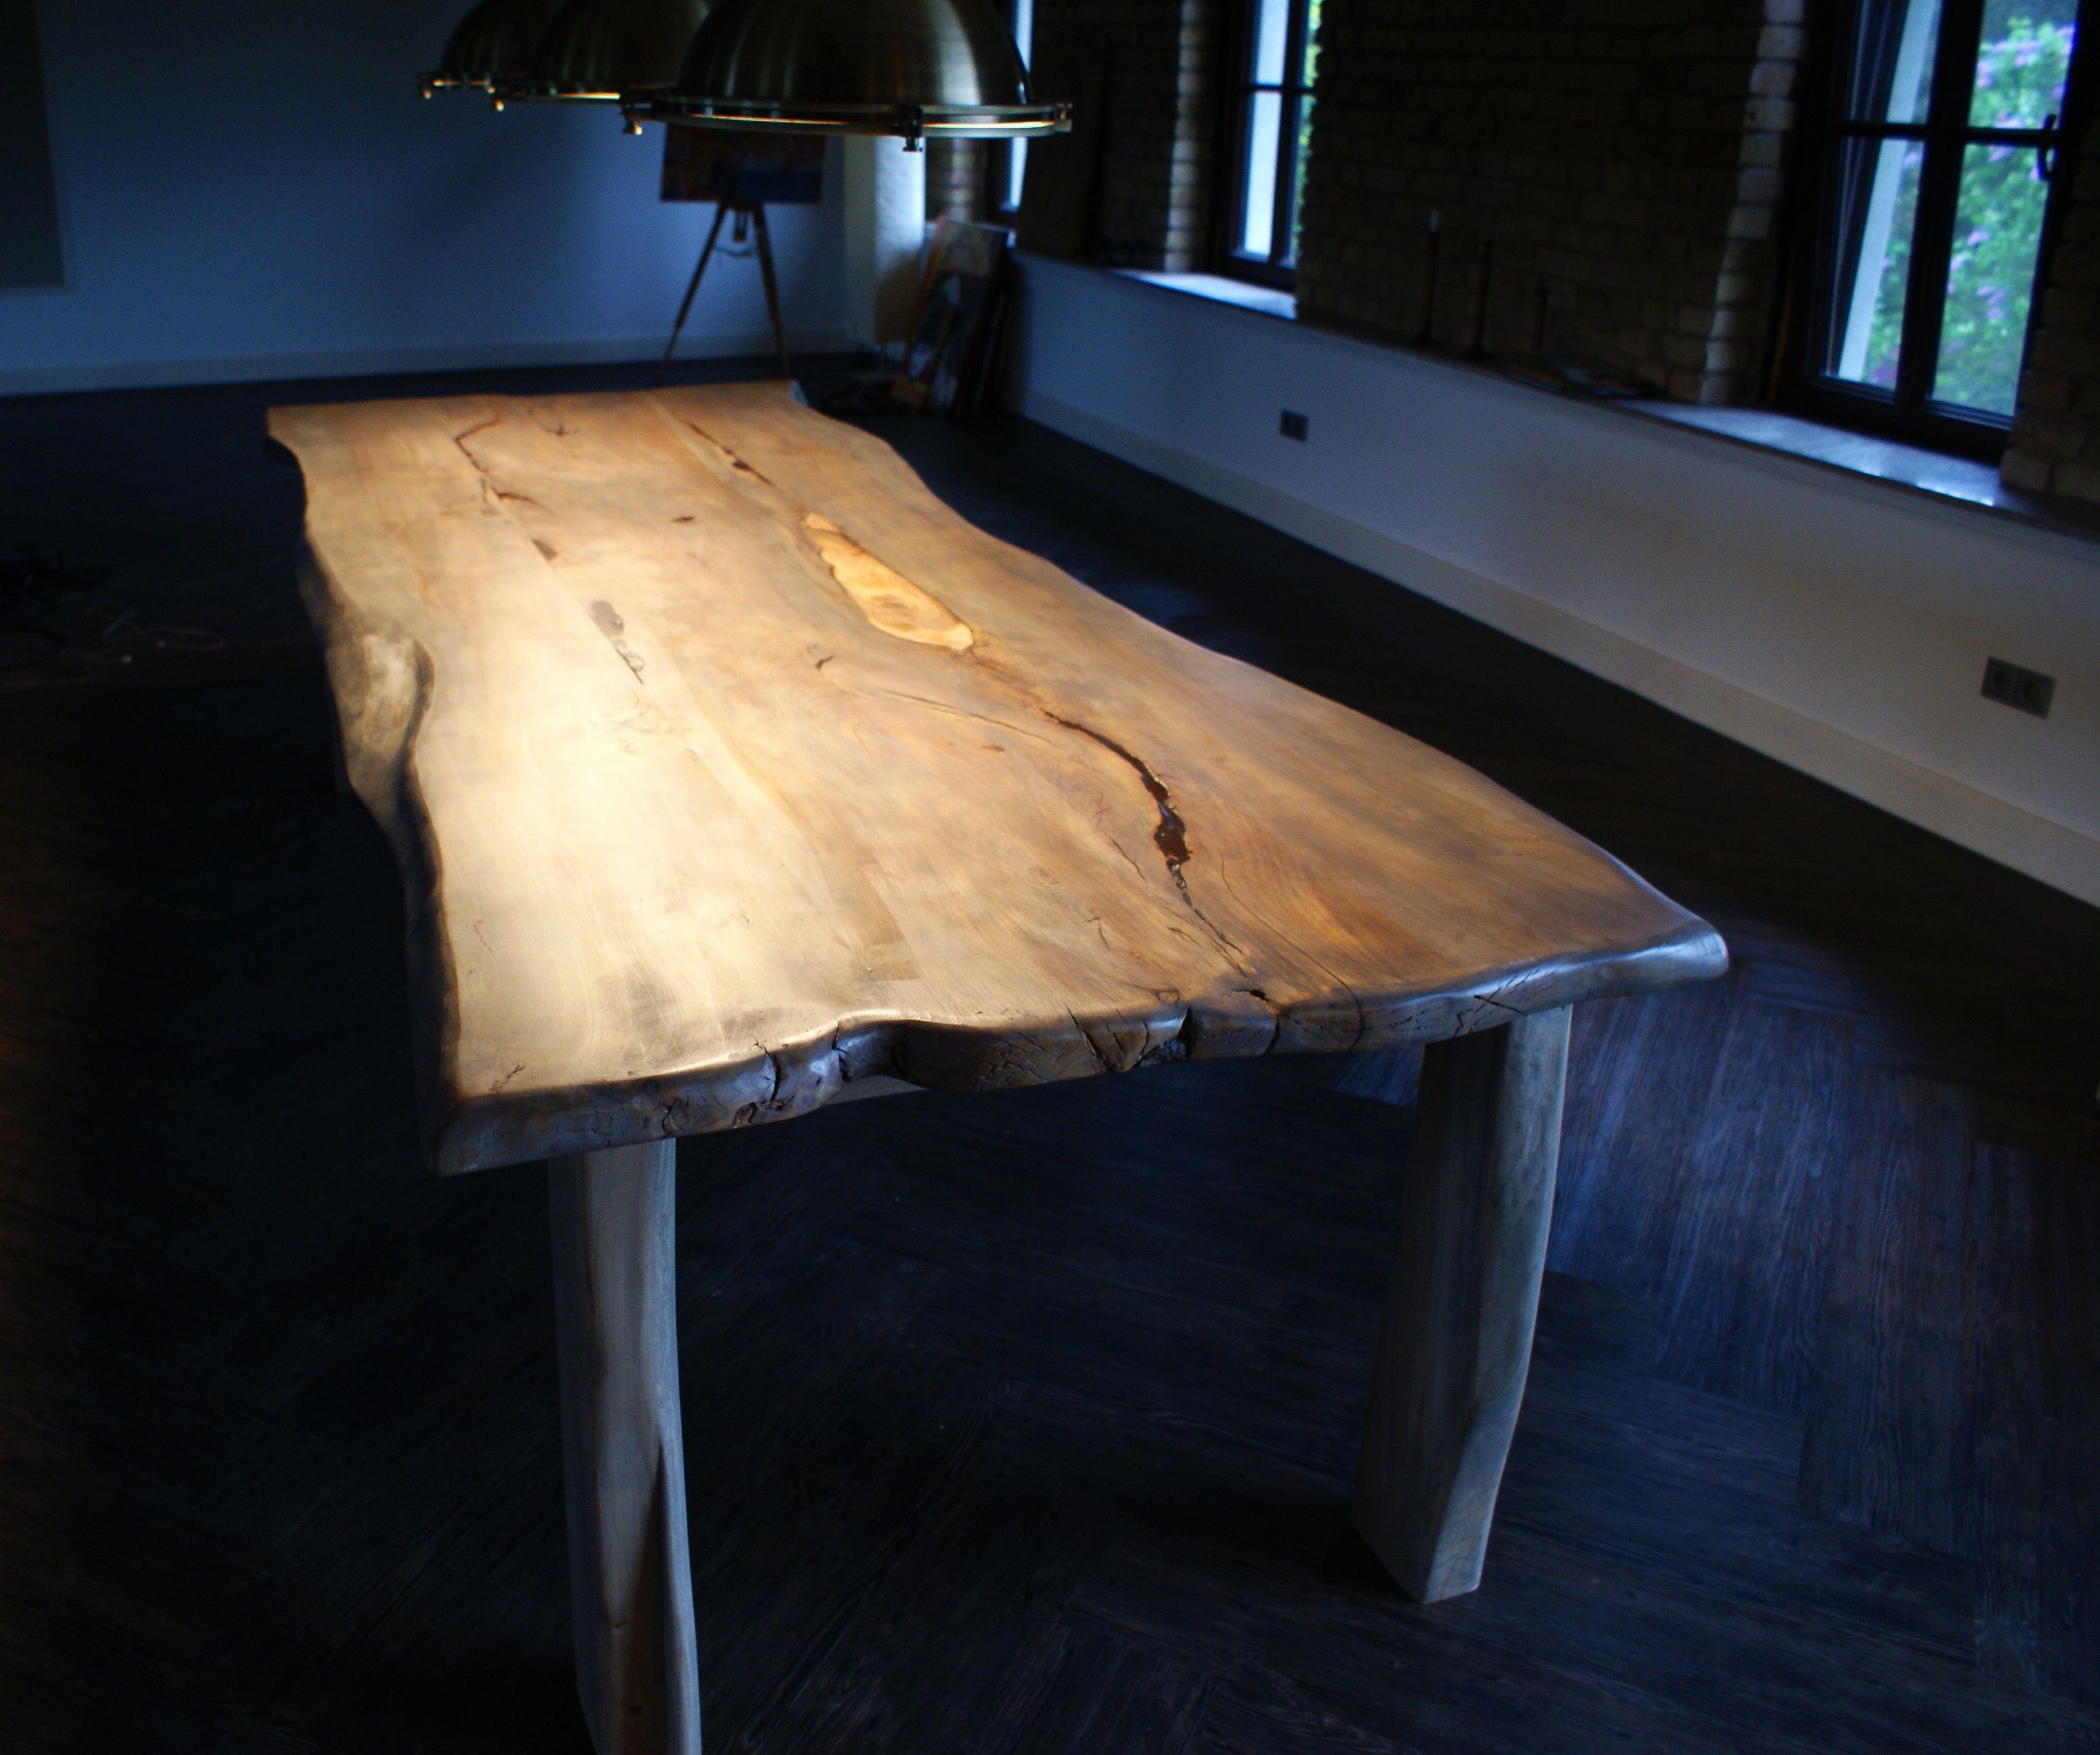 Holztisch rustikal  Großer Holztisch aus Ulme-Naturholz | maybe - similar - ideas ...